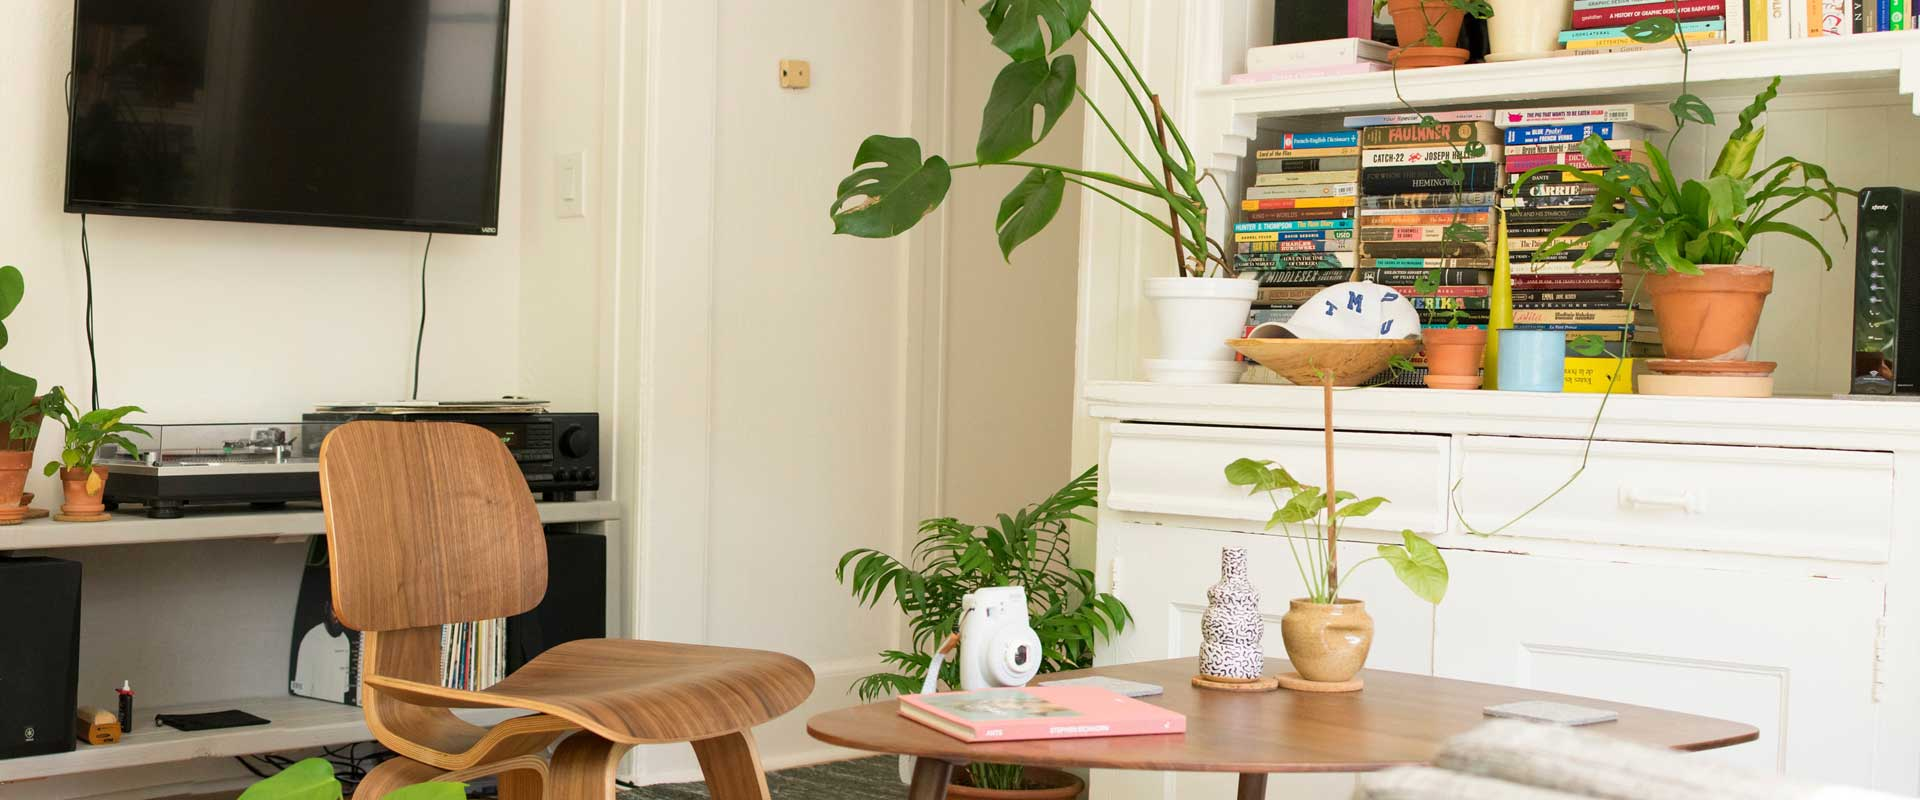 translator-dutch-home-appliance